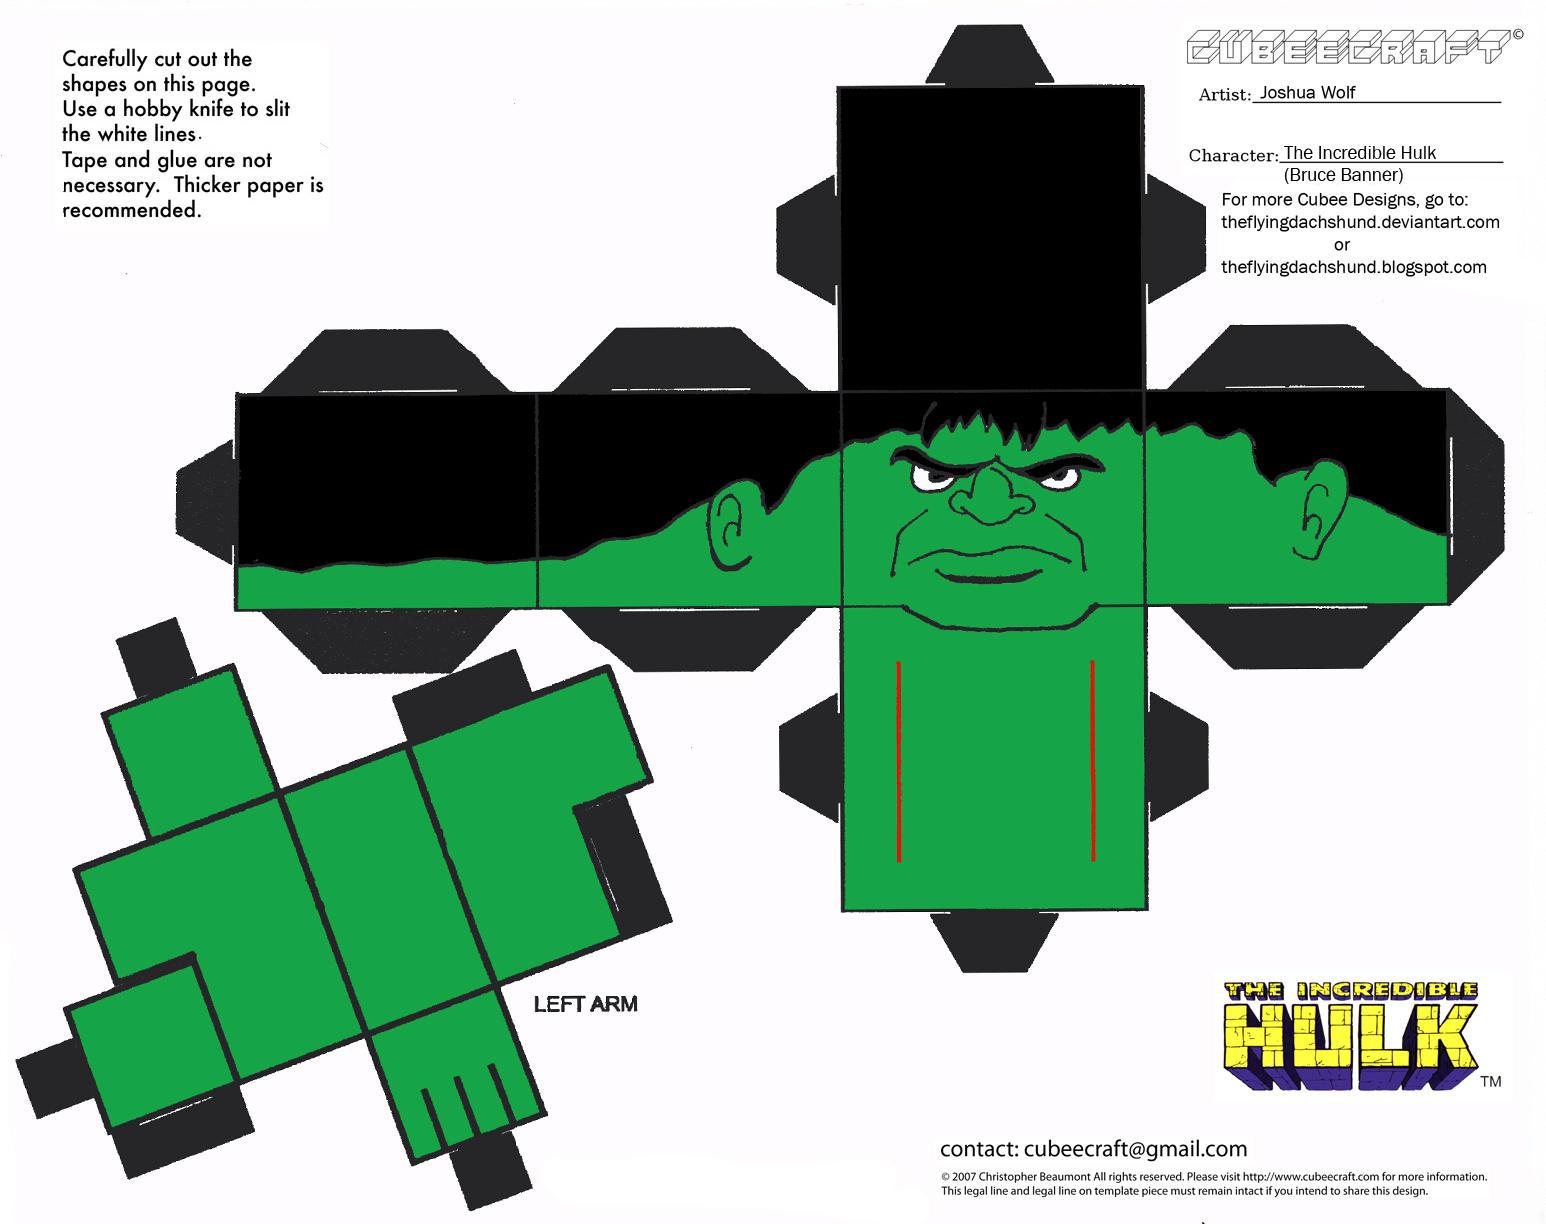 Hulk 3d Wallpaper Download Marvel 1 Hulk Cubee By Theflyingdachshund On Deviantart